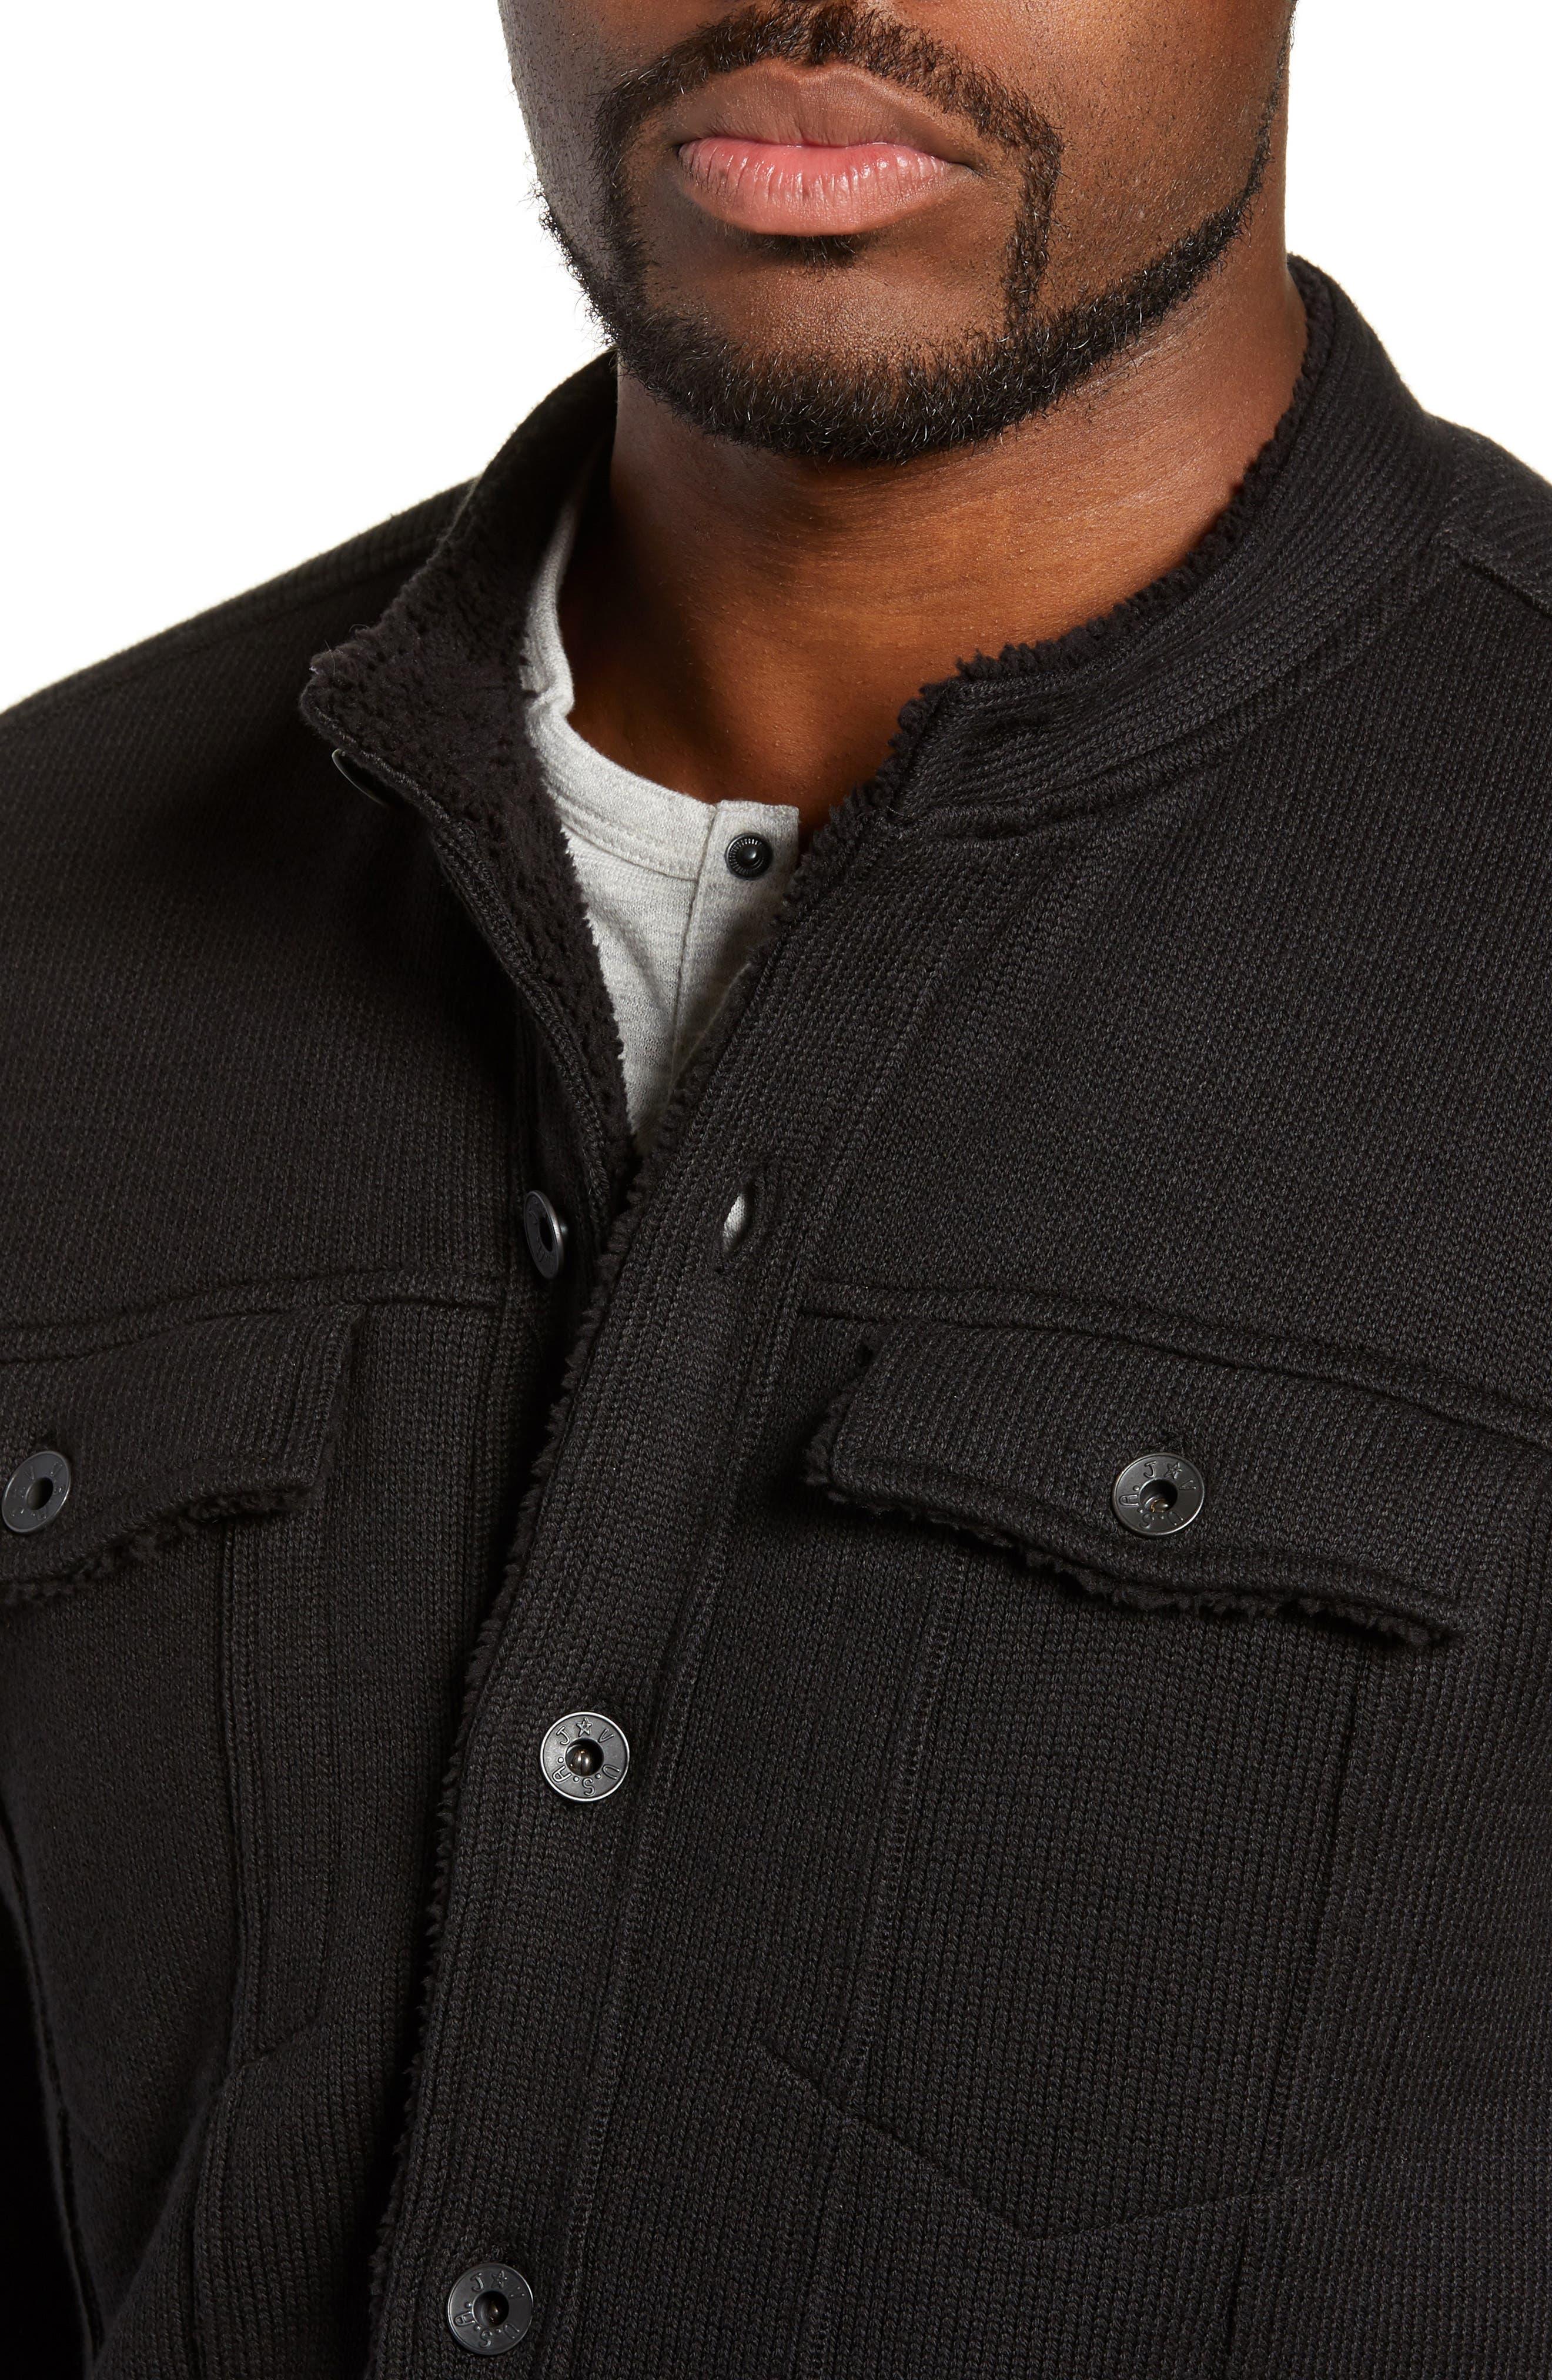 Lined Jean Jacket,                             Alternate thumbnail 4, color,                             BLACK